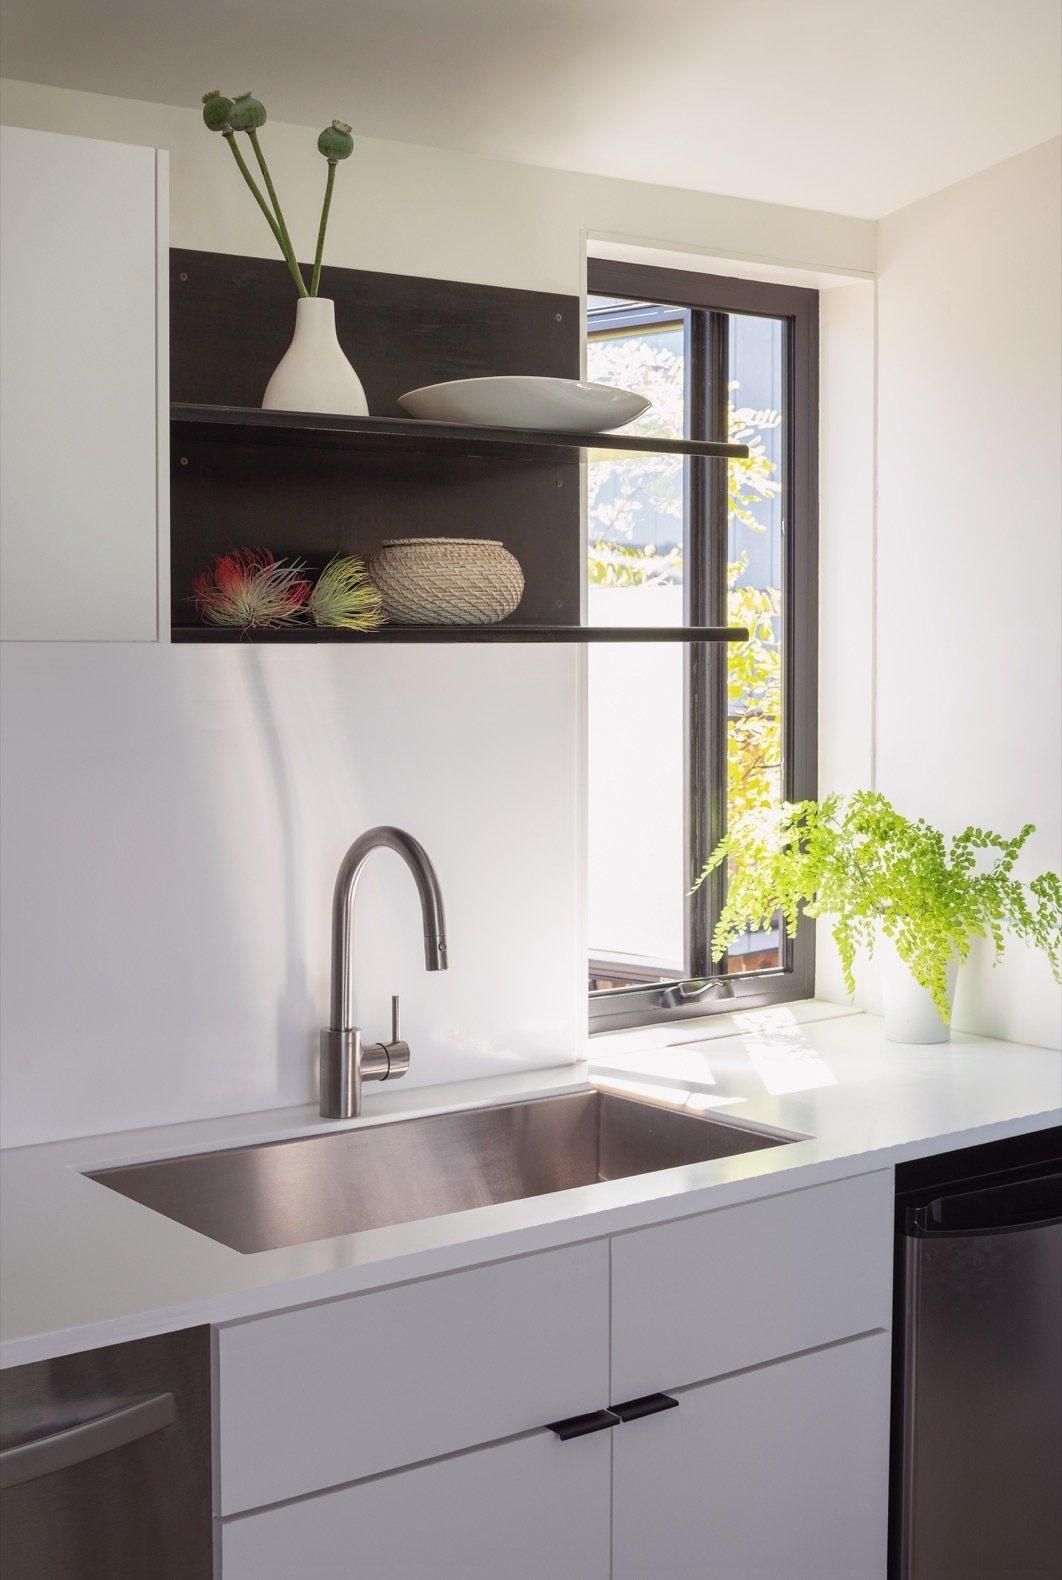 Solar Studio prefab kitchen